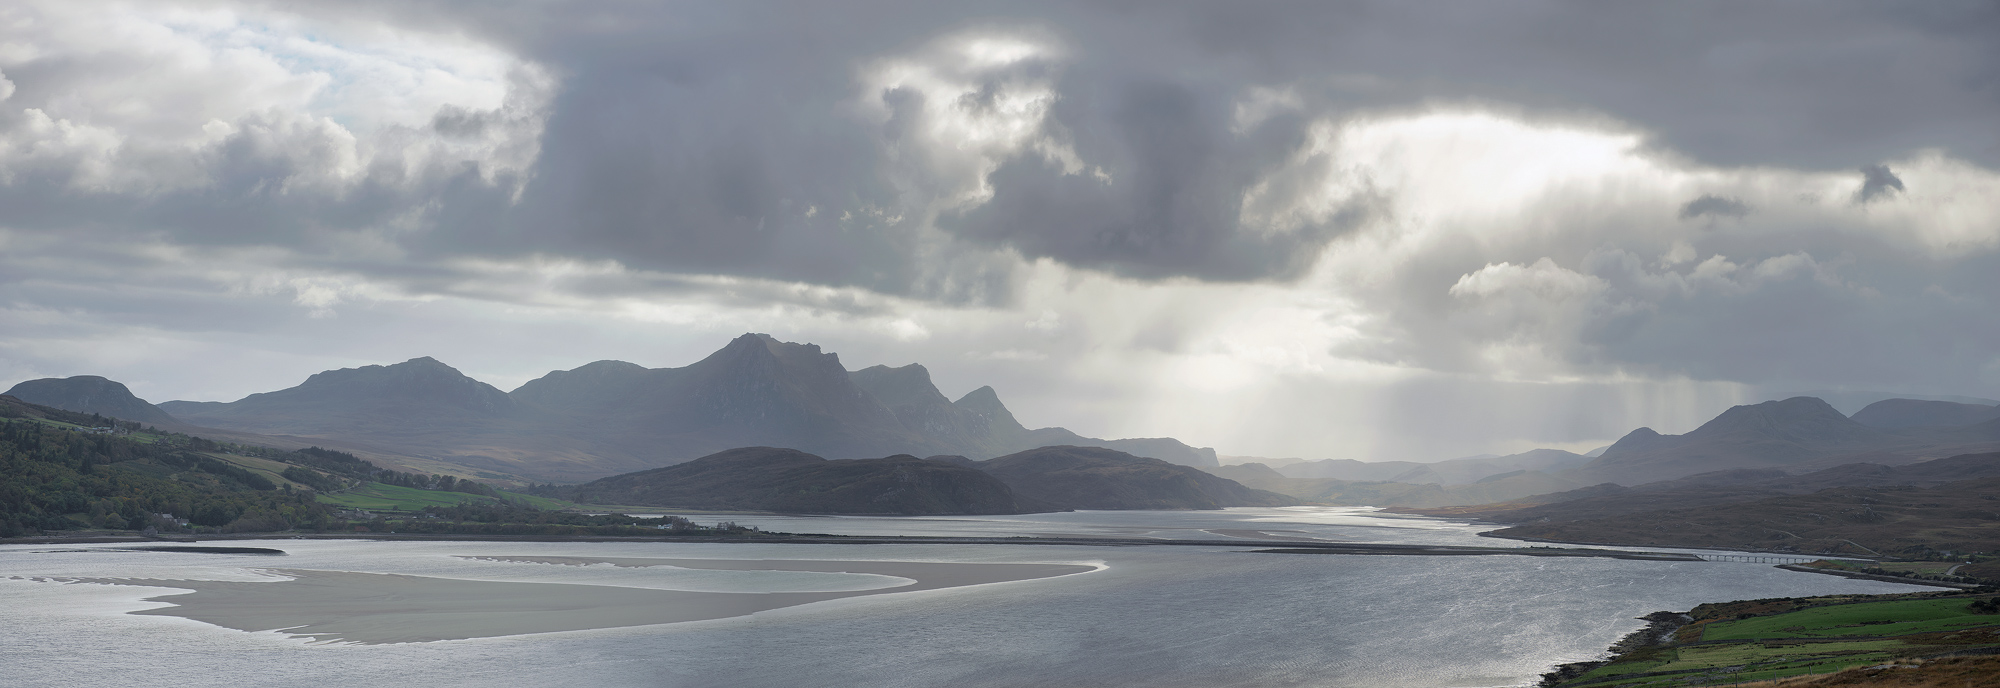 Skinnet View Pano, Skinnet, Sutherland, Scotland, Tongue, estuary, tidal excursion, tide, sand, pastel, beige, blue, col, photo